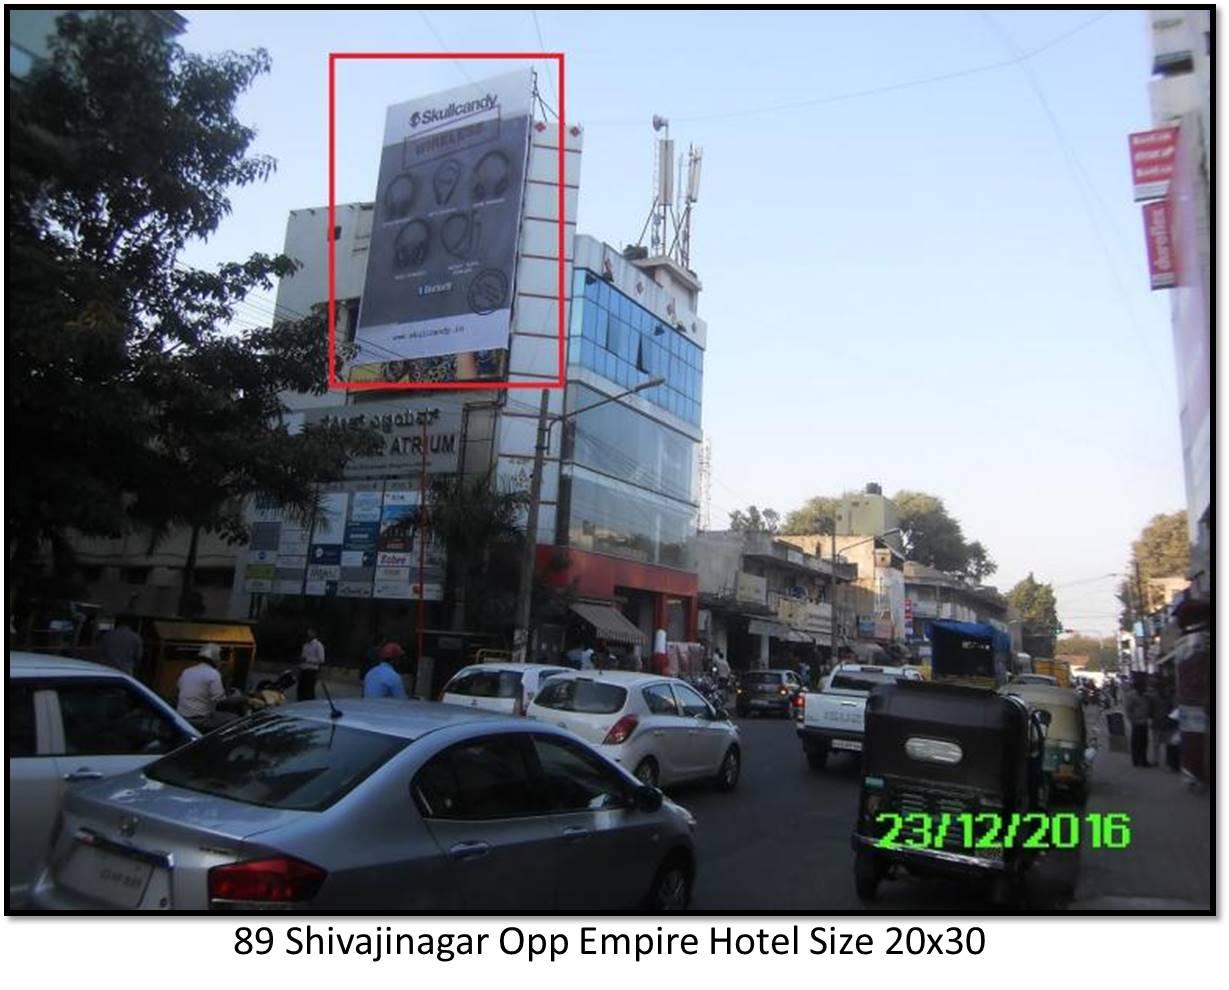 Shivajinagar Opp Empire Hotel, Bengaluru